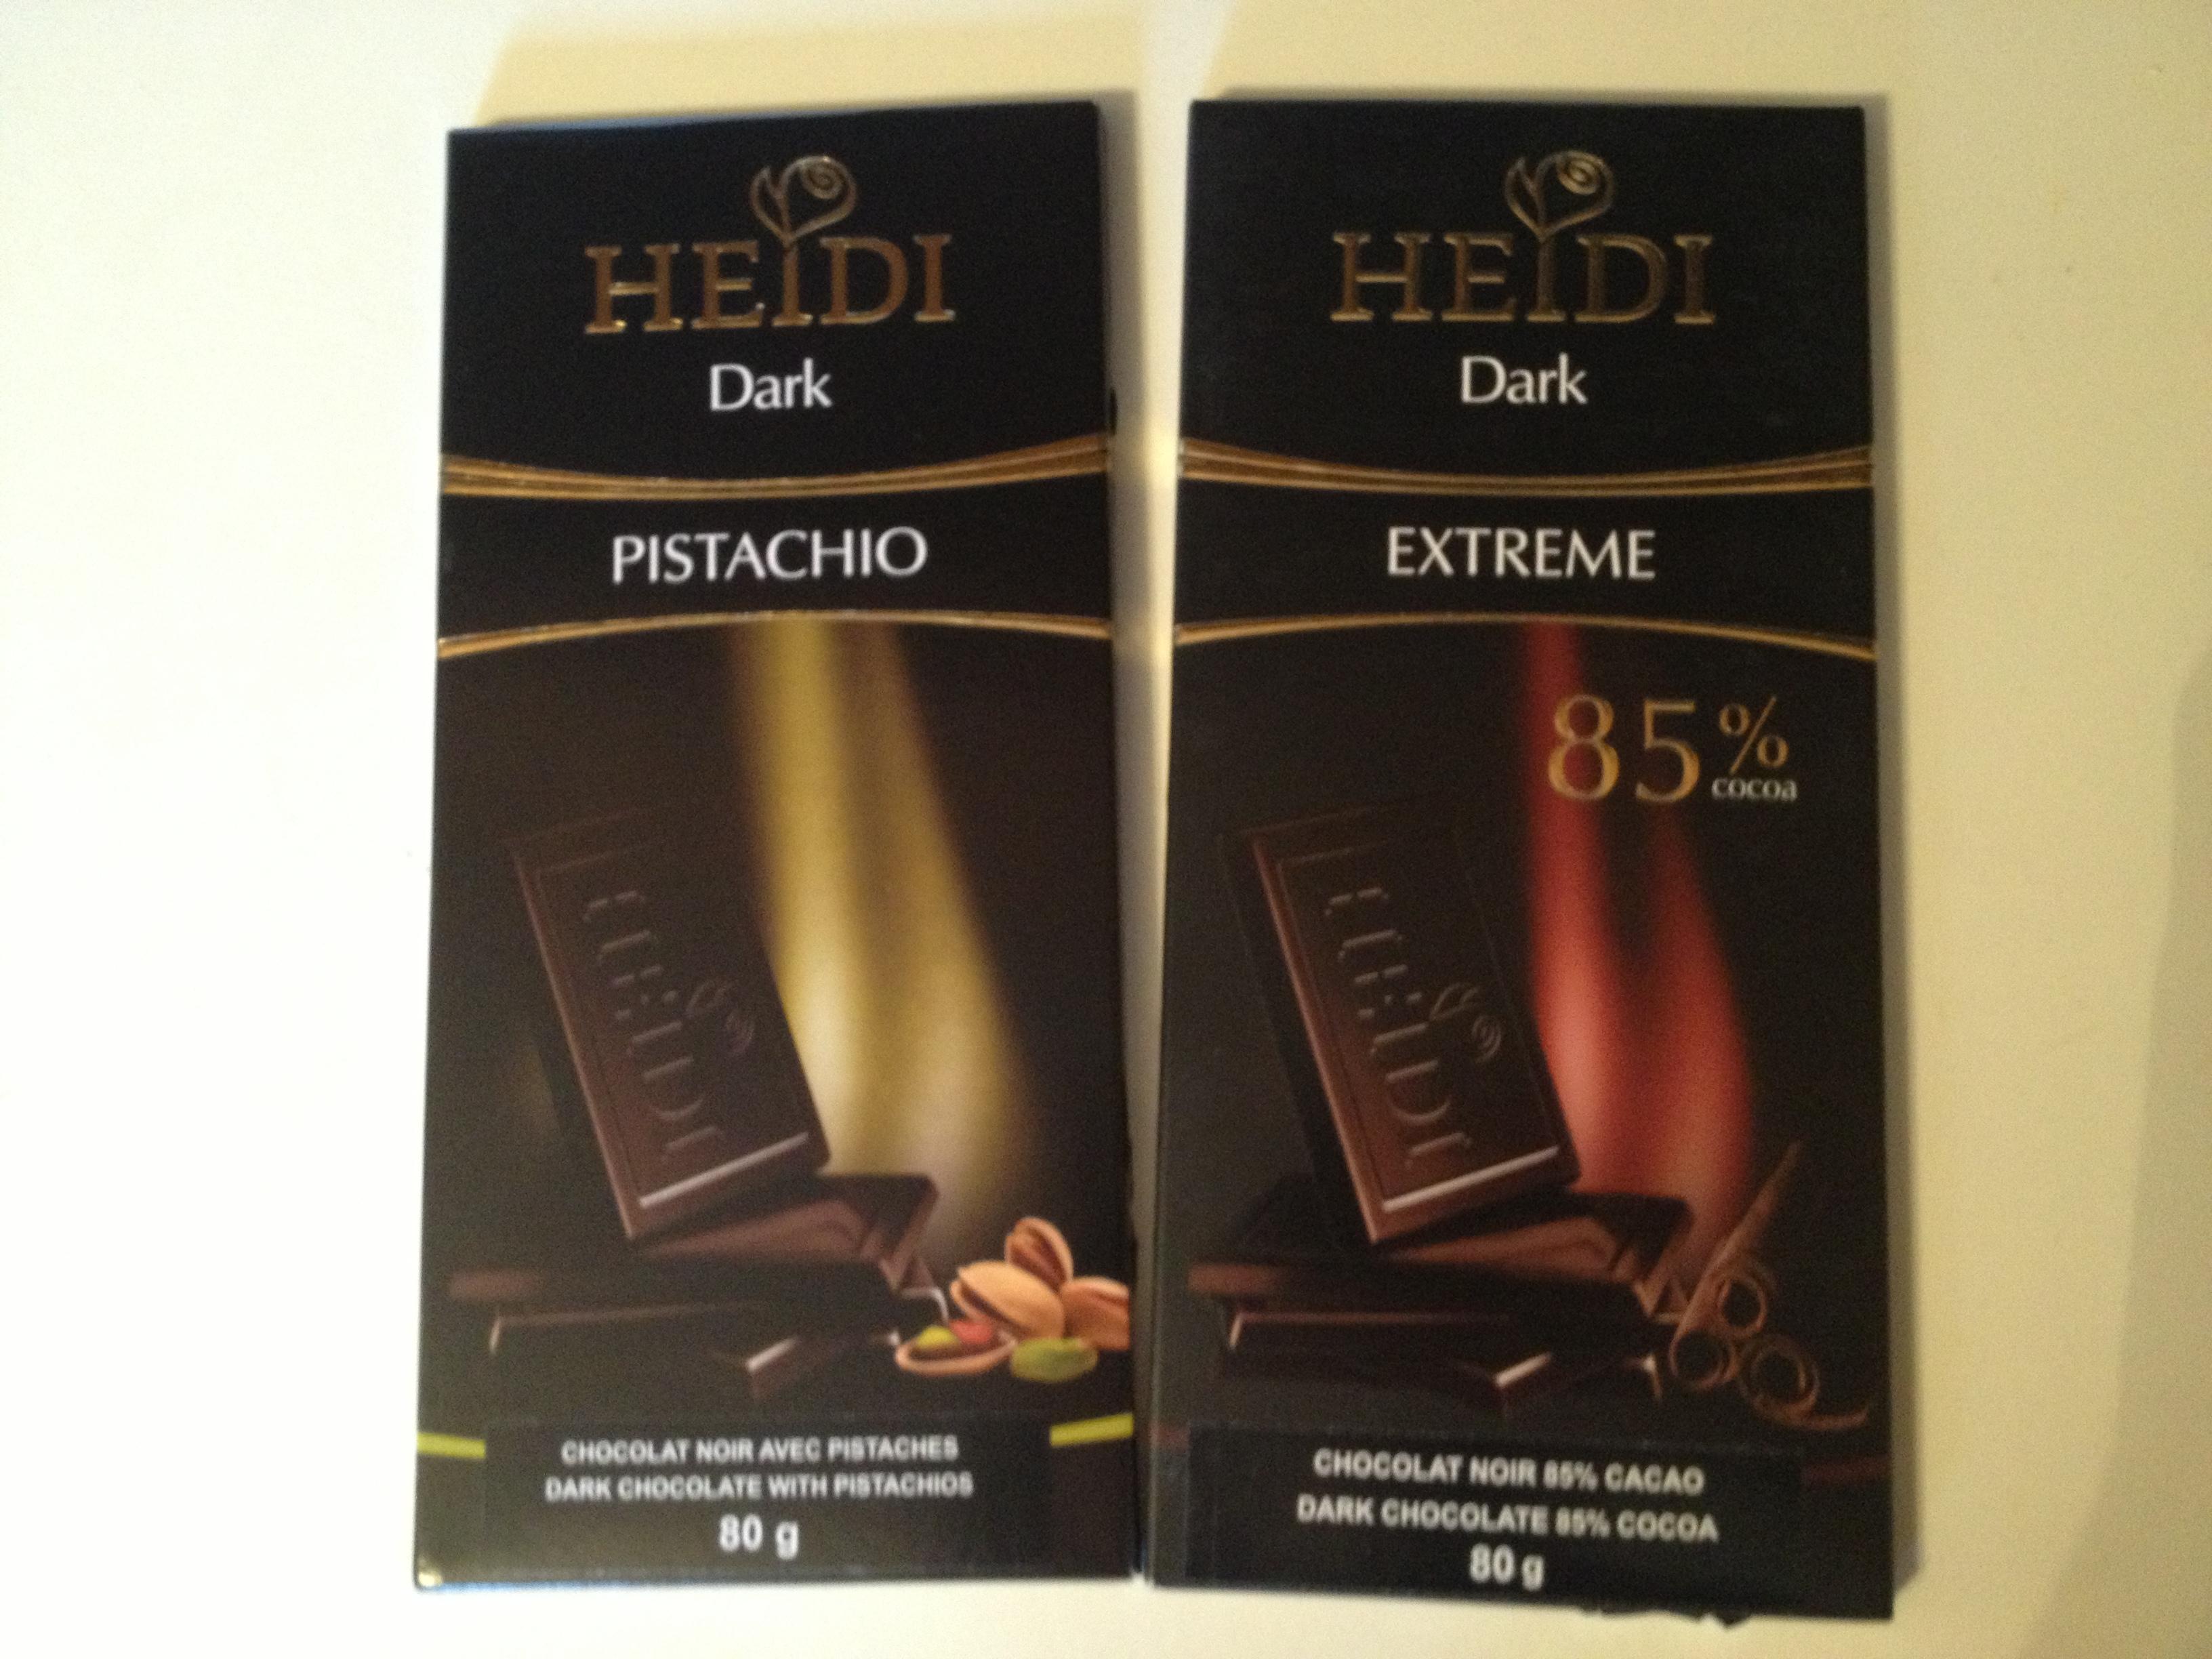 Heidi brand Chocolate!